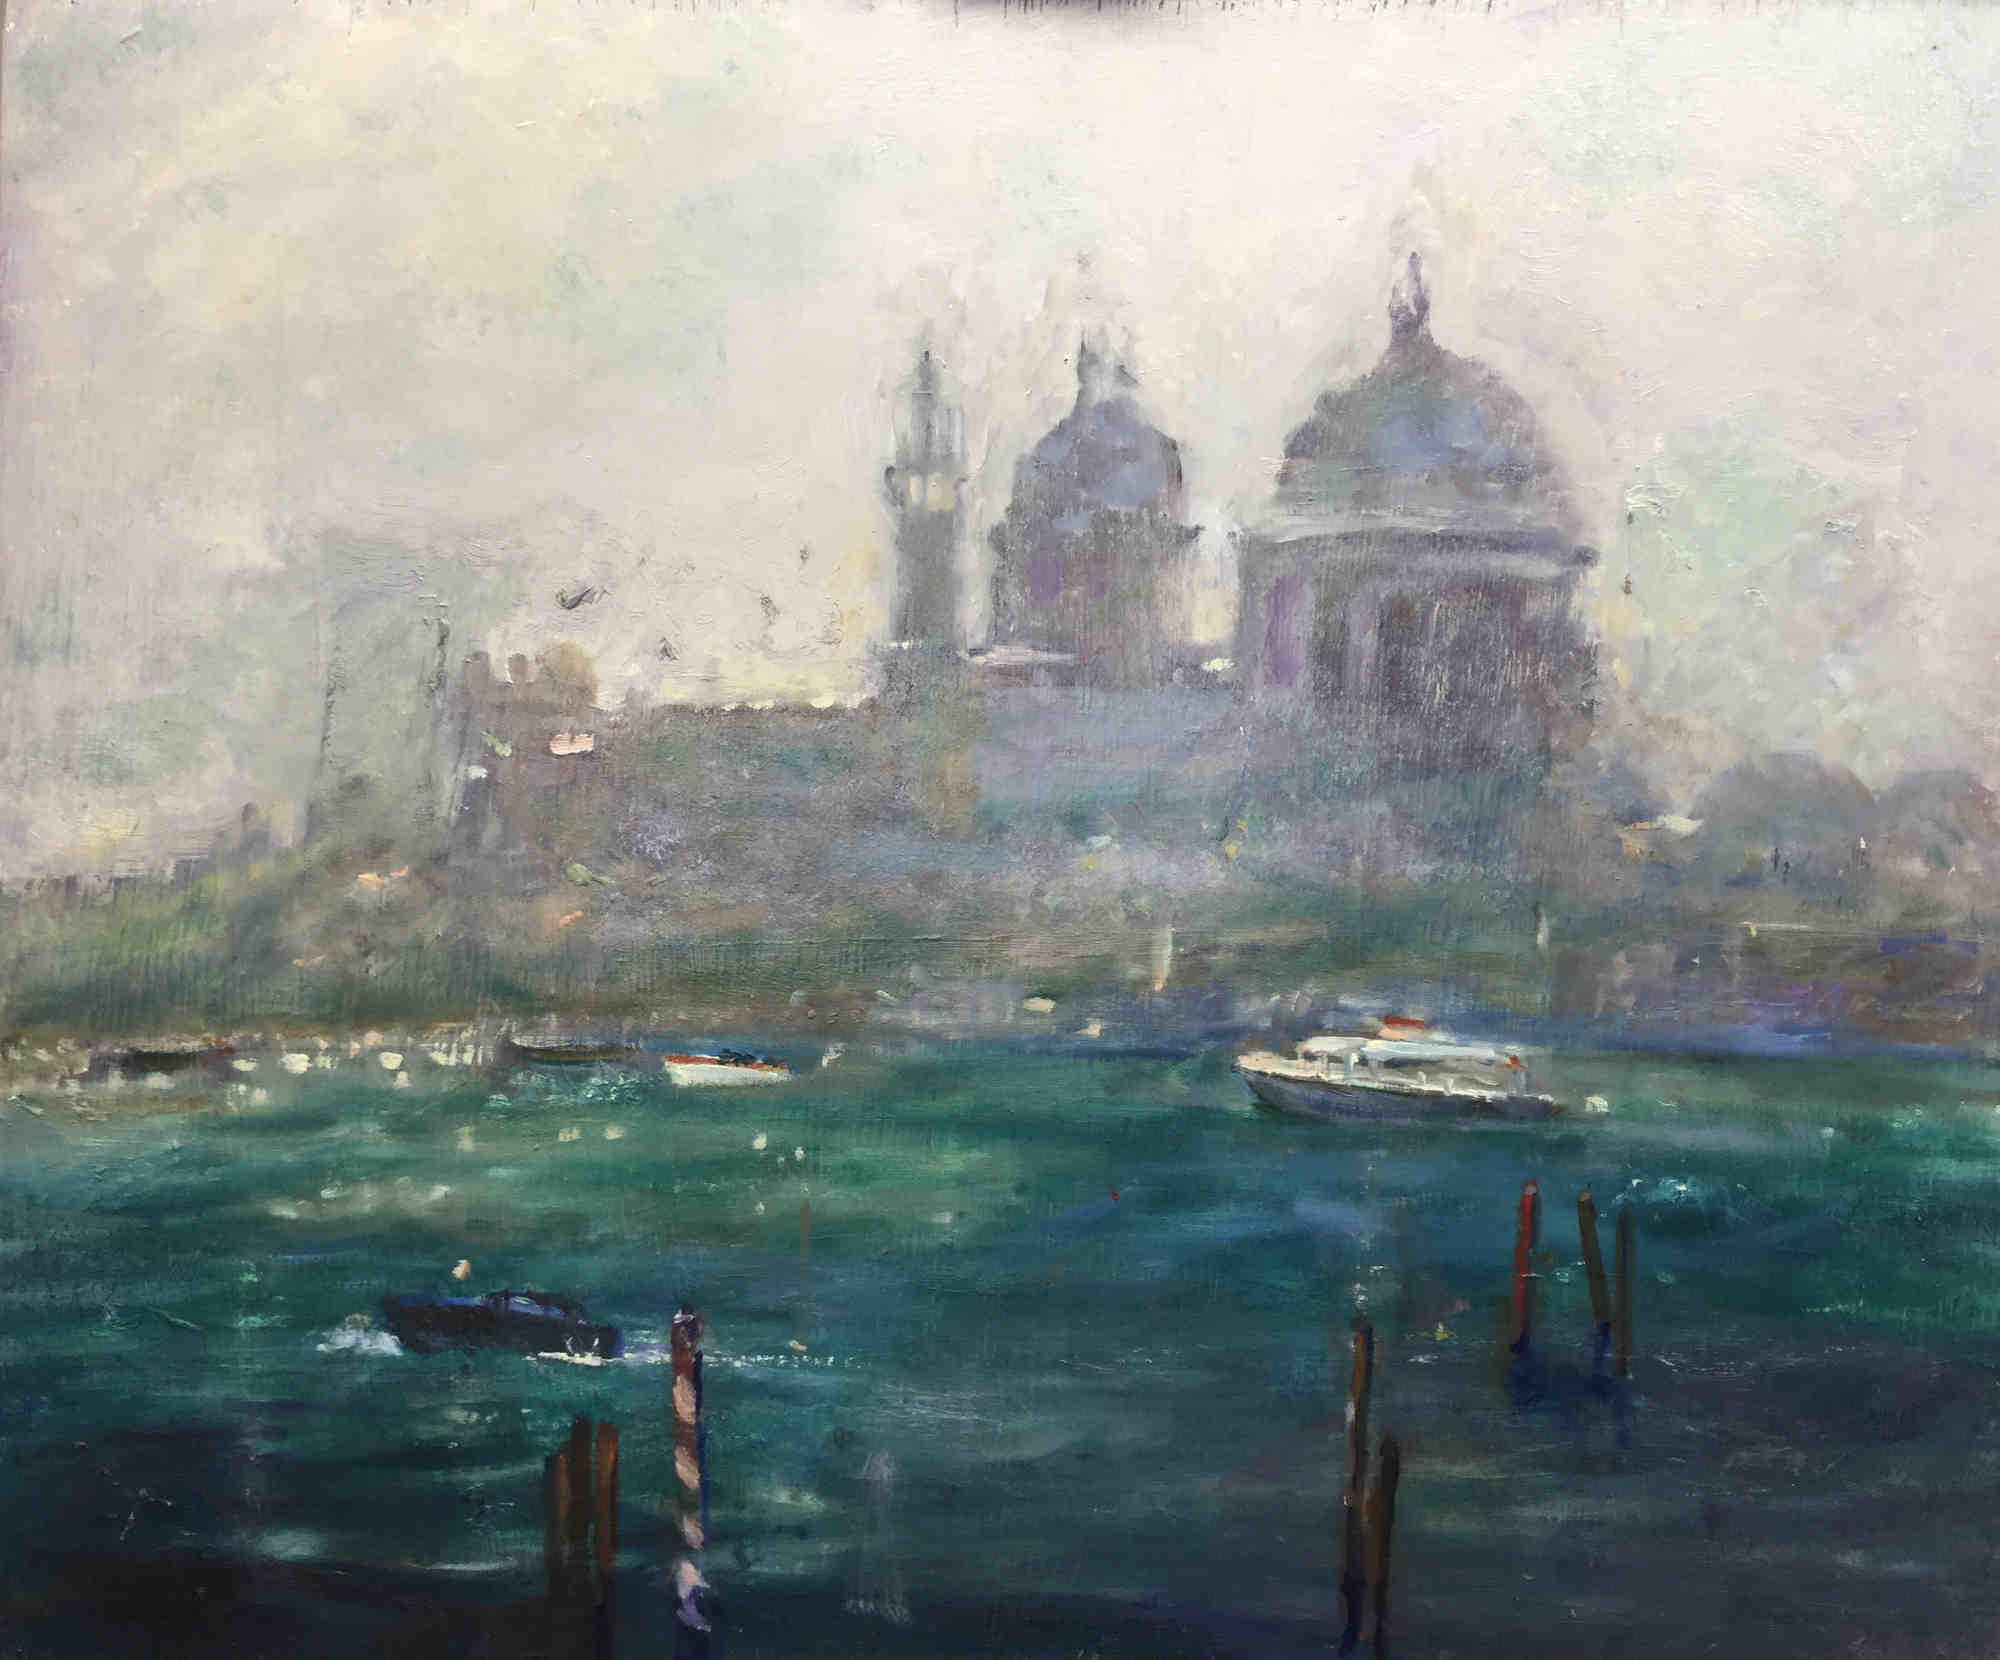 Venice City of Dreams- Judith Donaghy